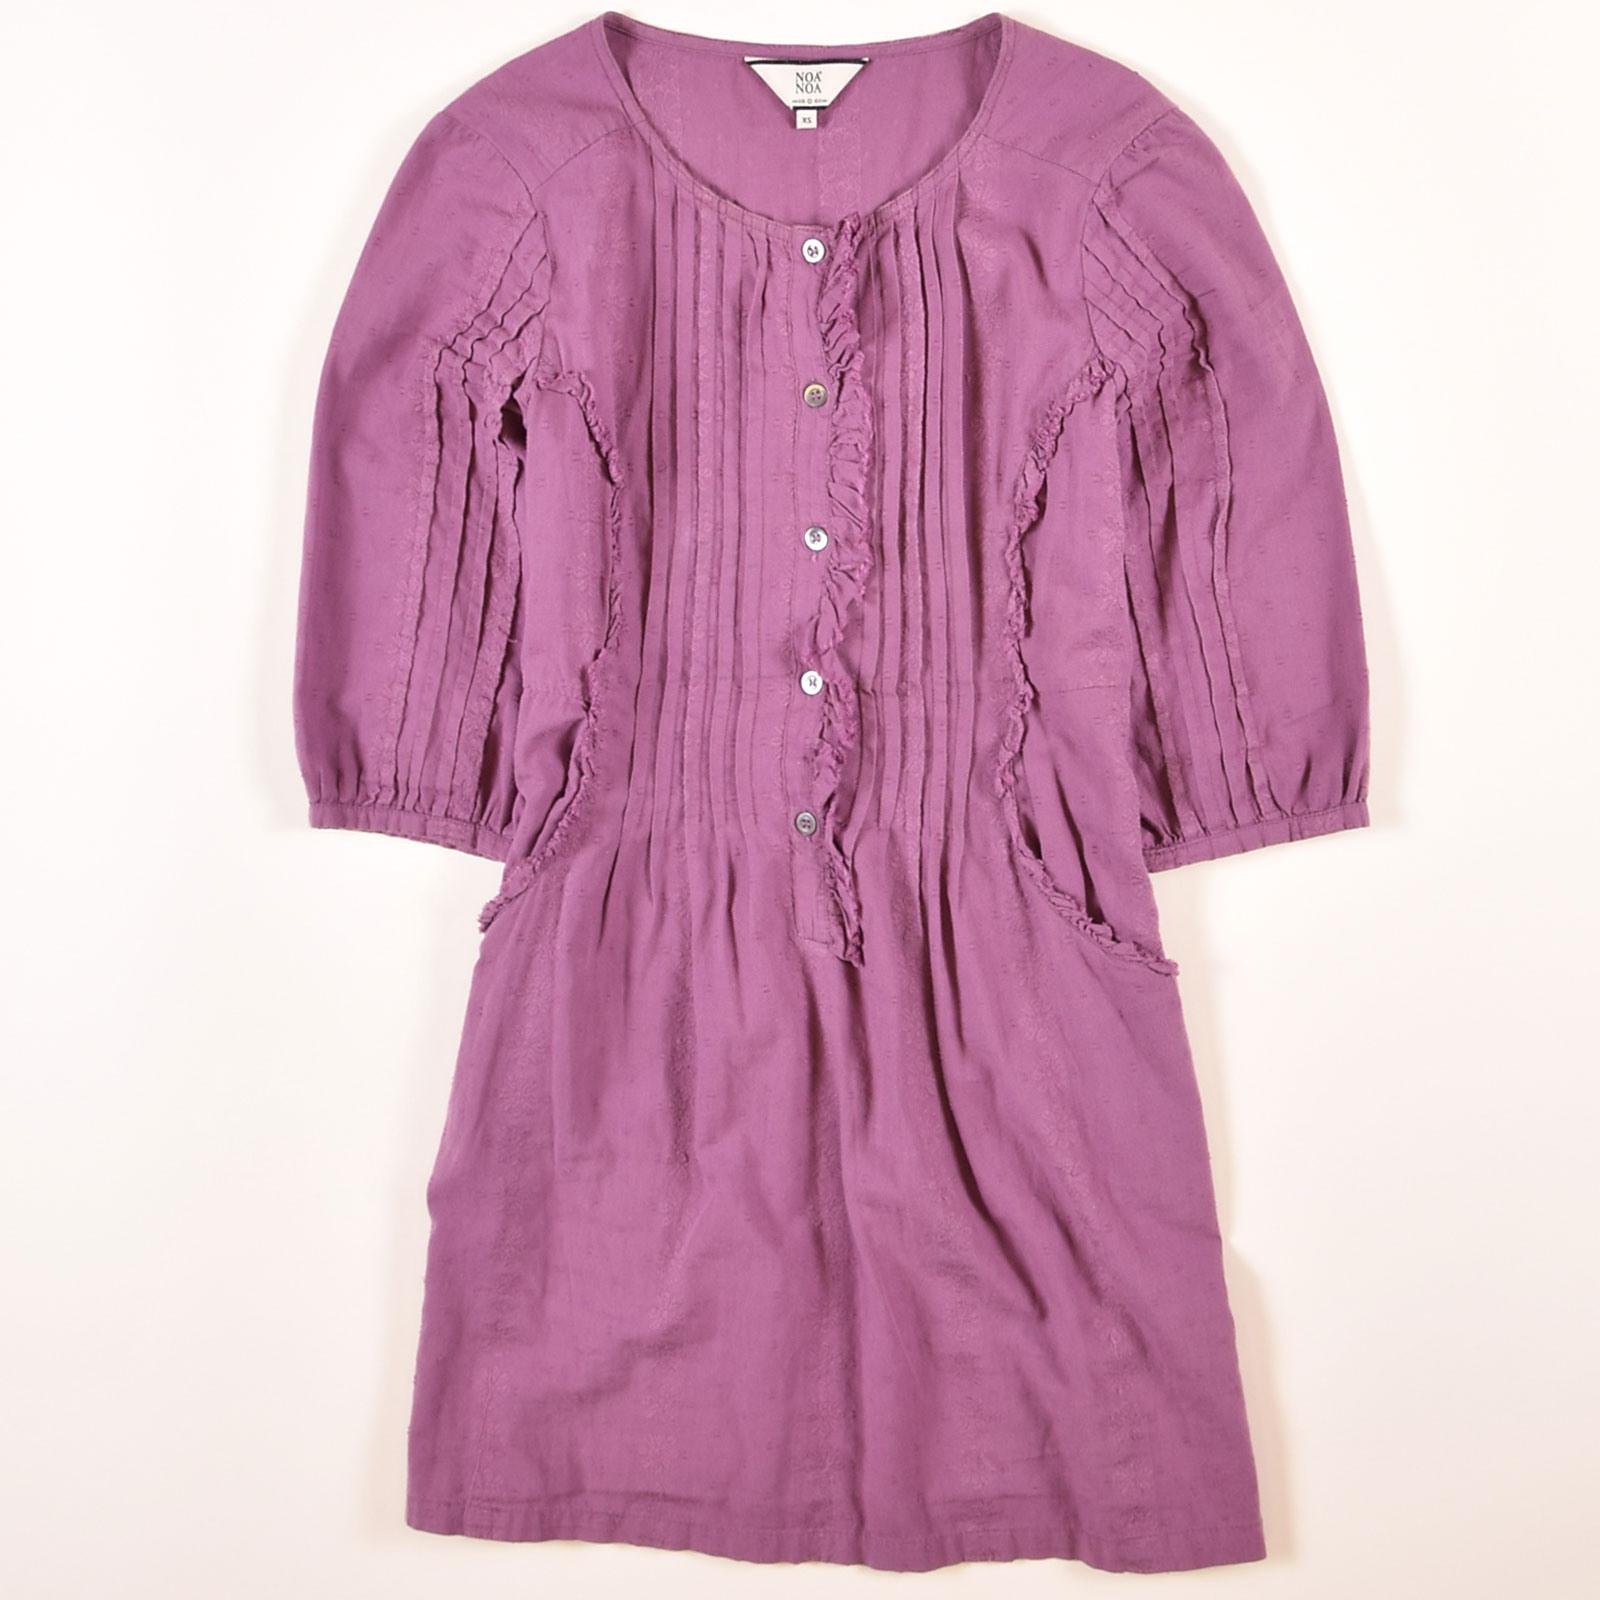 Noa Noa Damen Kleid Dress Grxs De 34 Lila 46538  Ebay